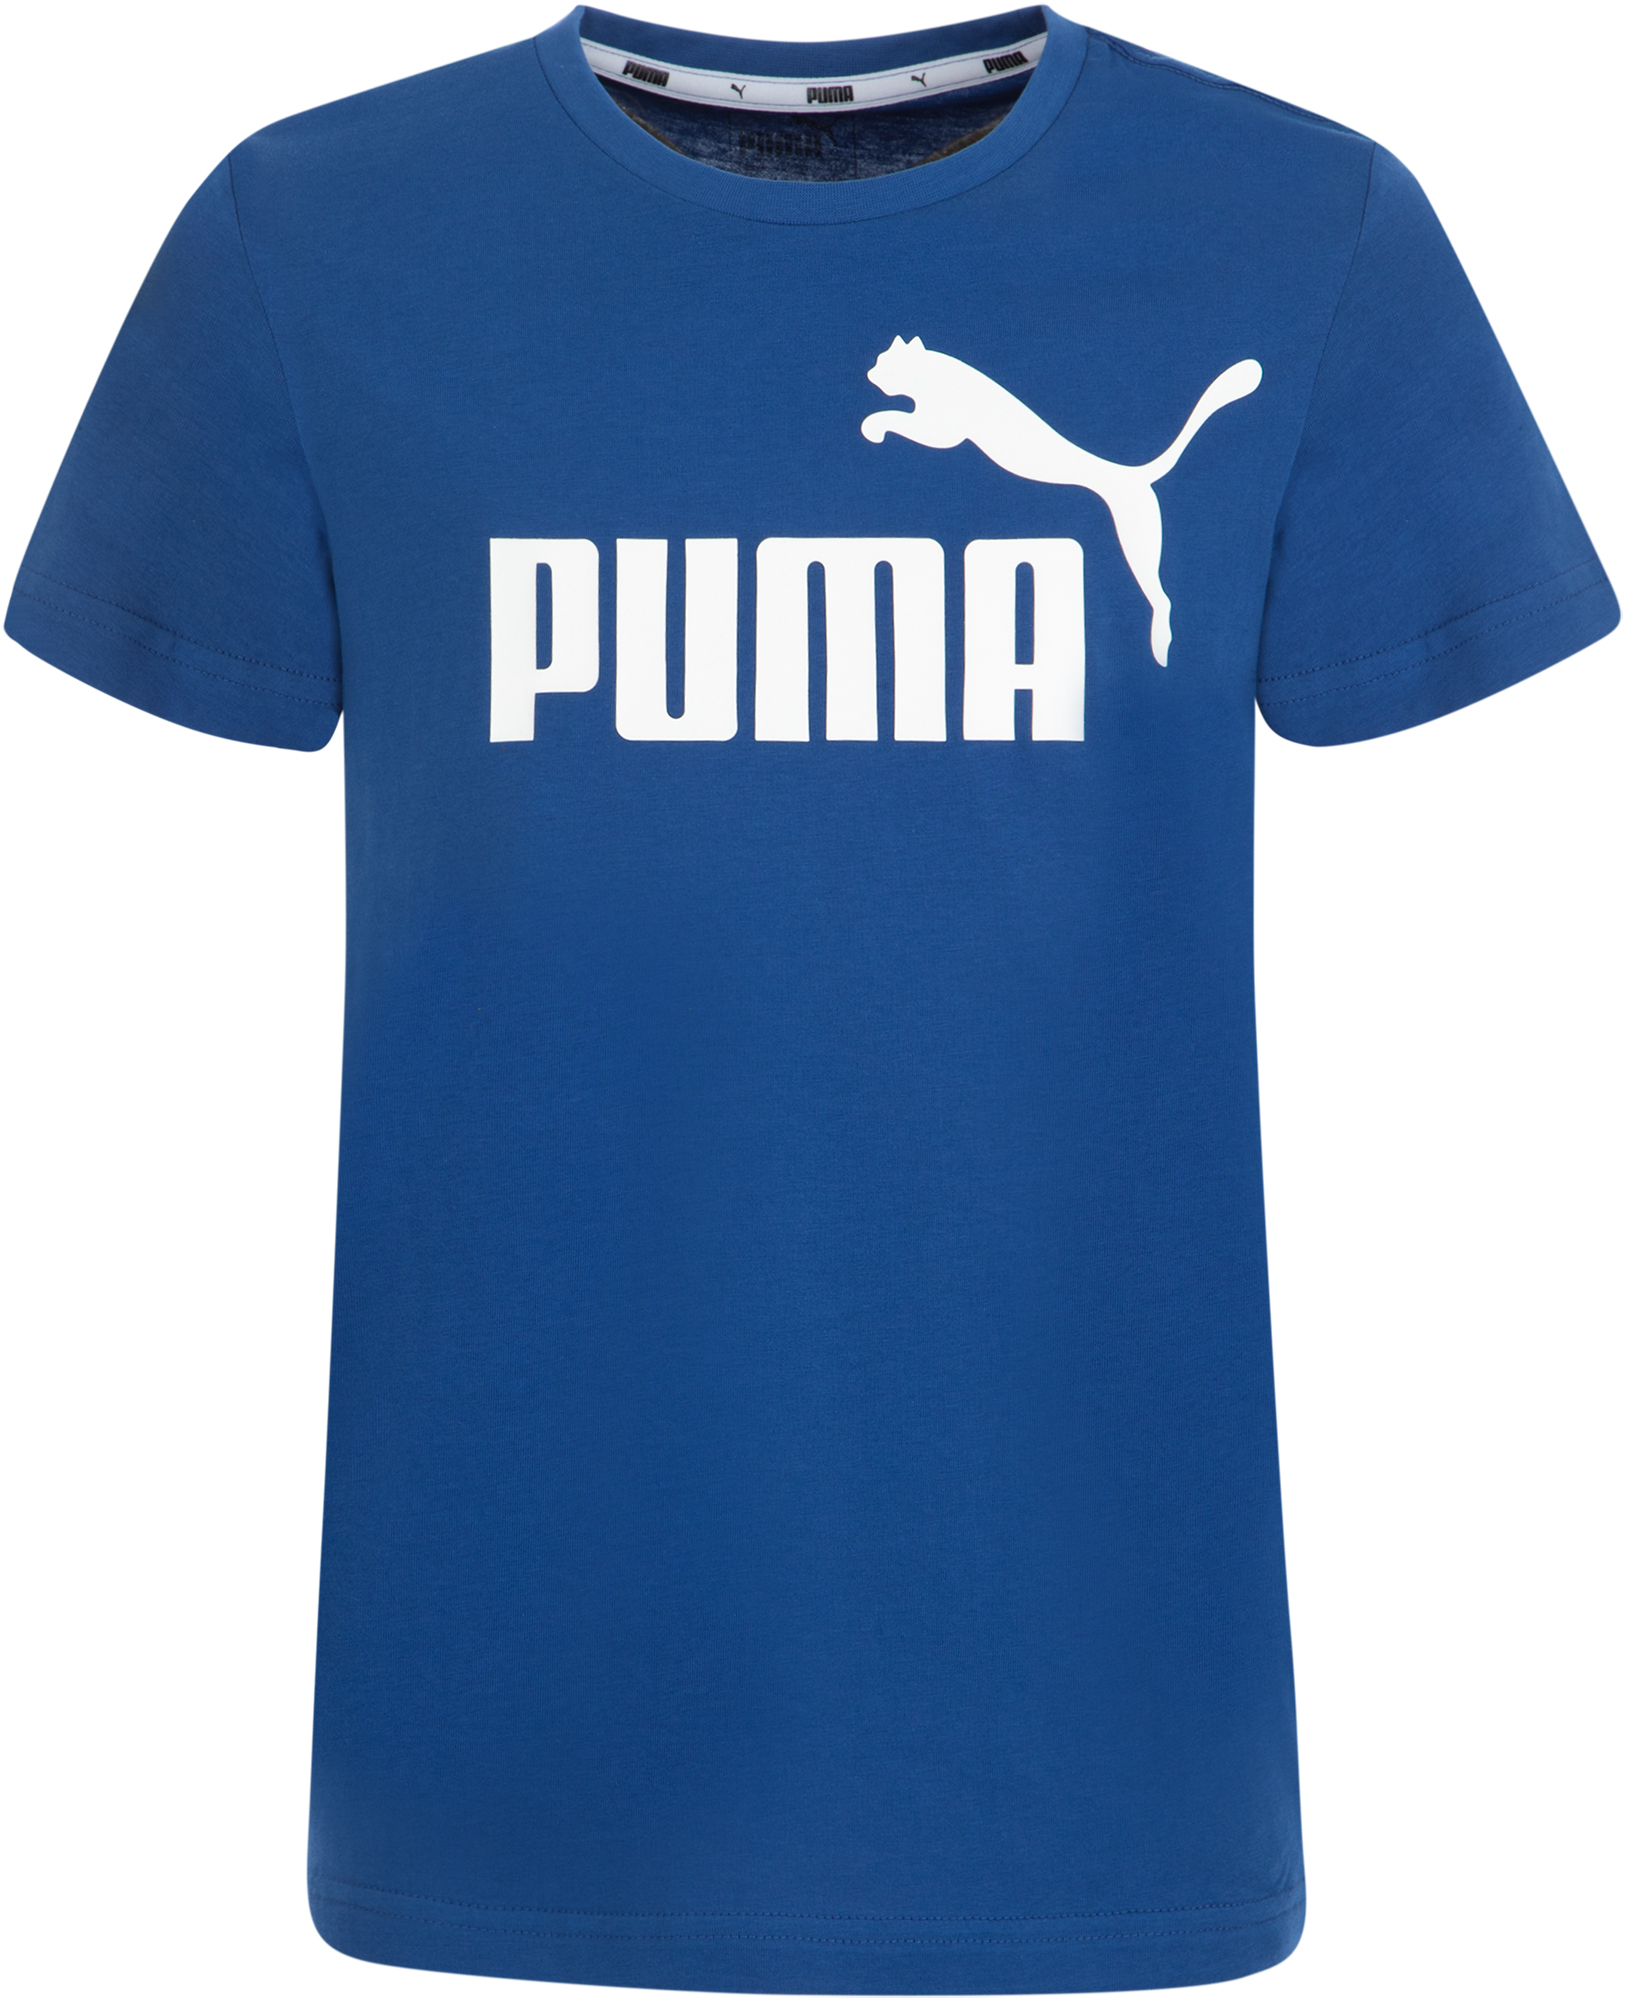 Puma Футболка для мальчиков Puma ESS Logo Tee B, размер 176 футболка женская puma evo tee цвет персиковый 57511231 размер m 44 46